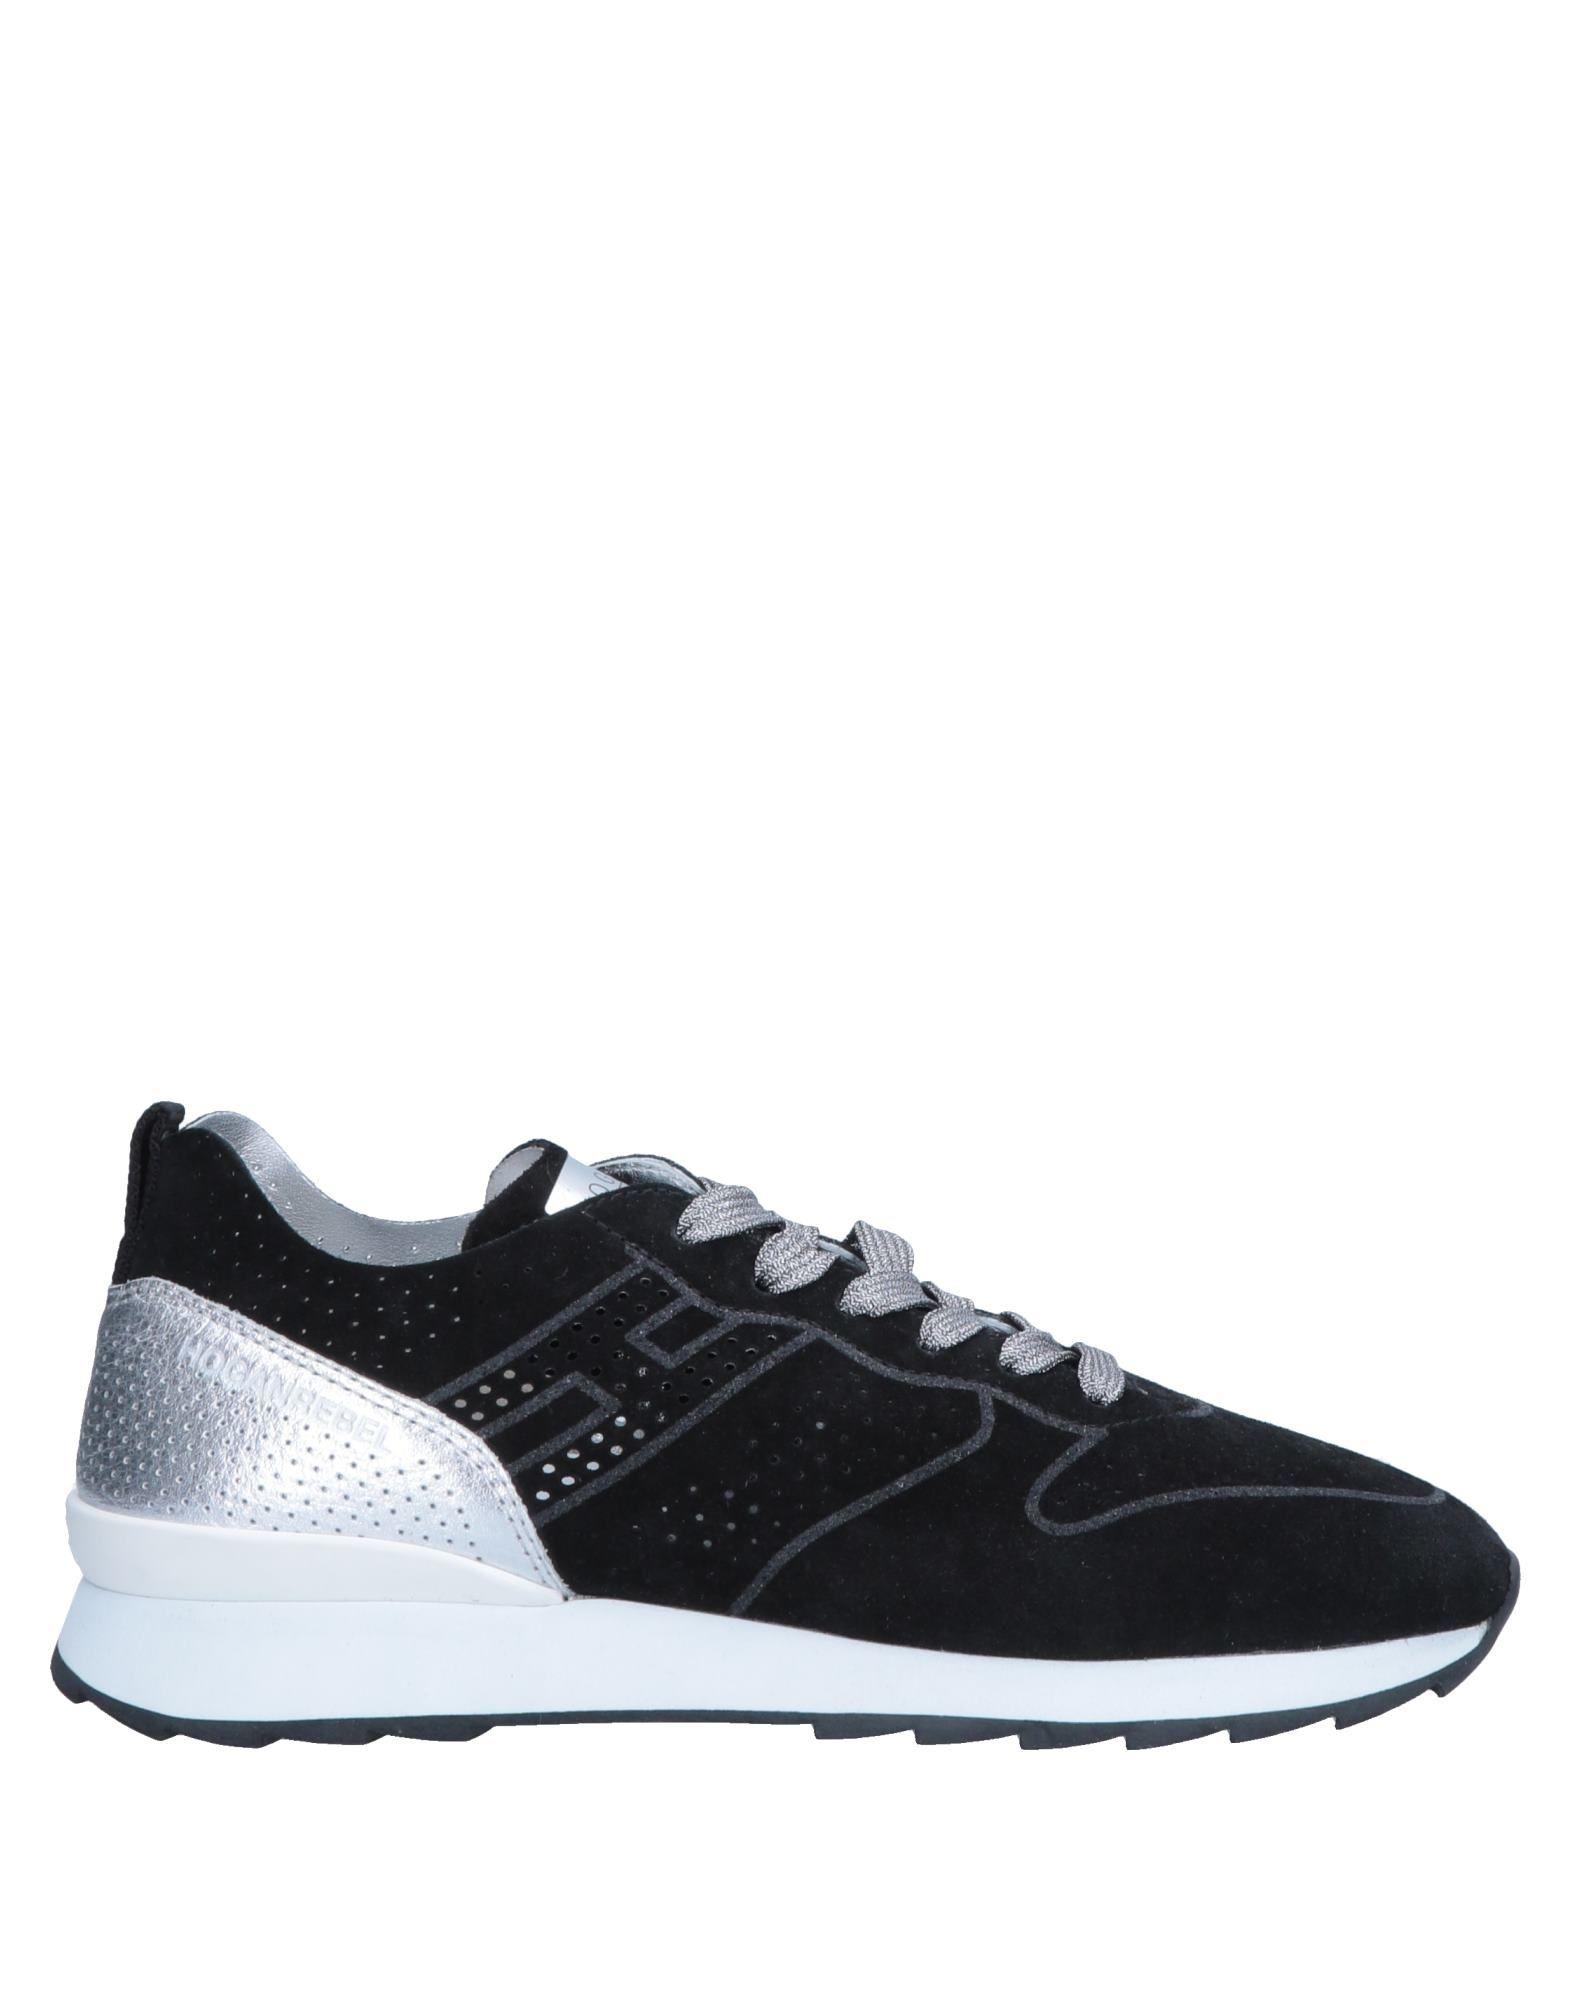 Stilvolle billige Schuhe Hogan Rebel 11564530UF Sneakers Damen  11564530UF Rebel 022b1f